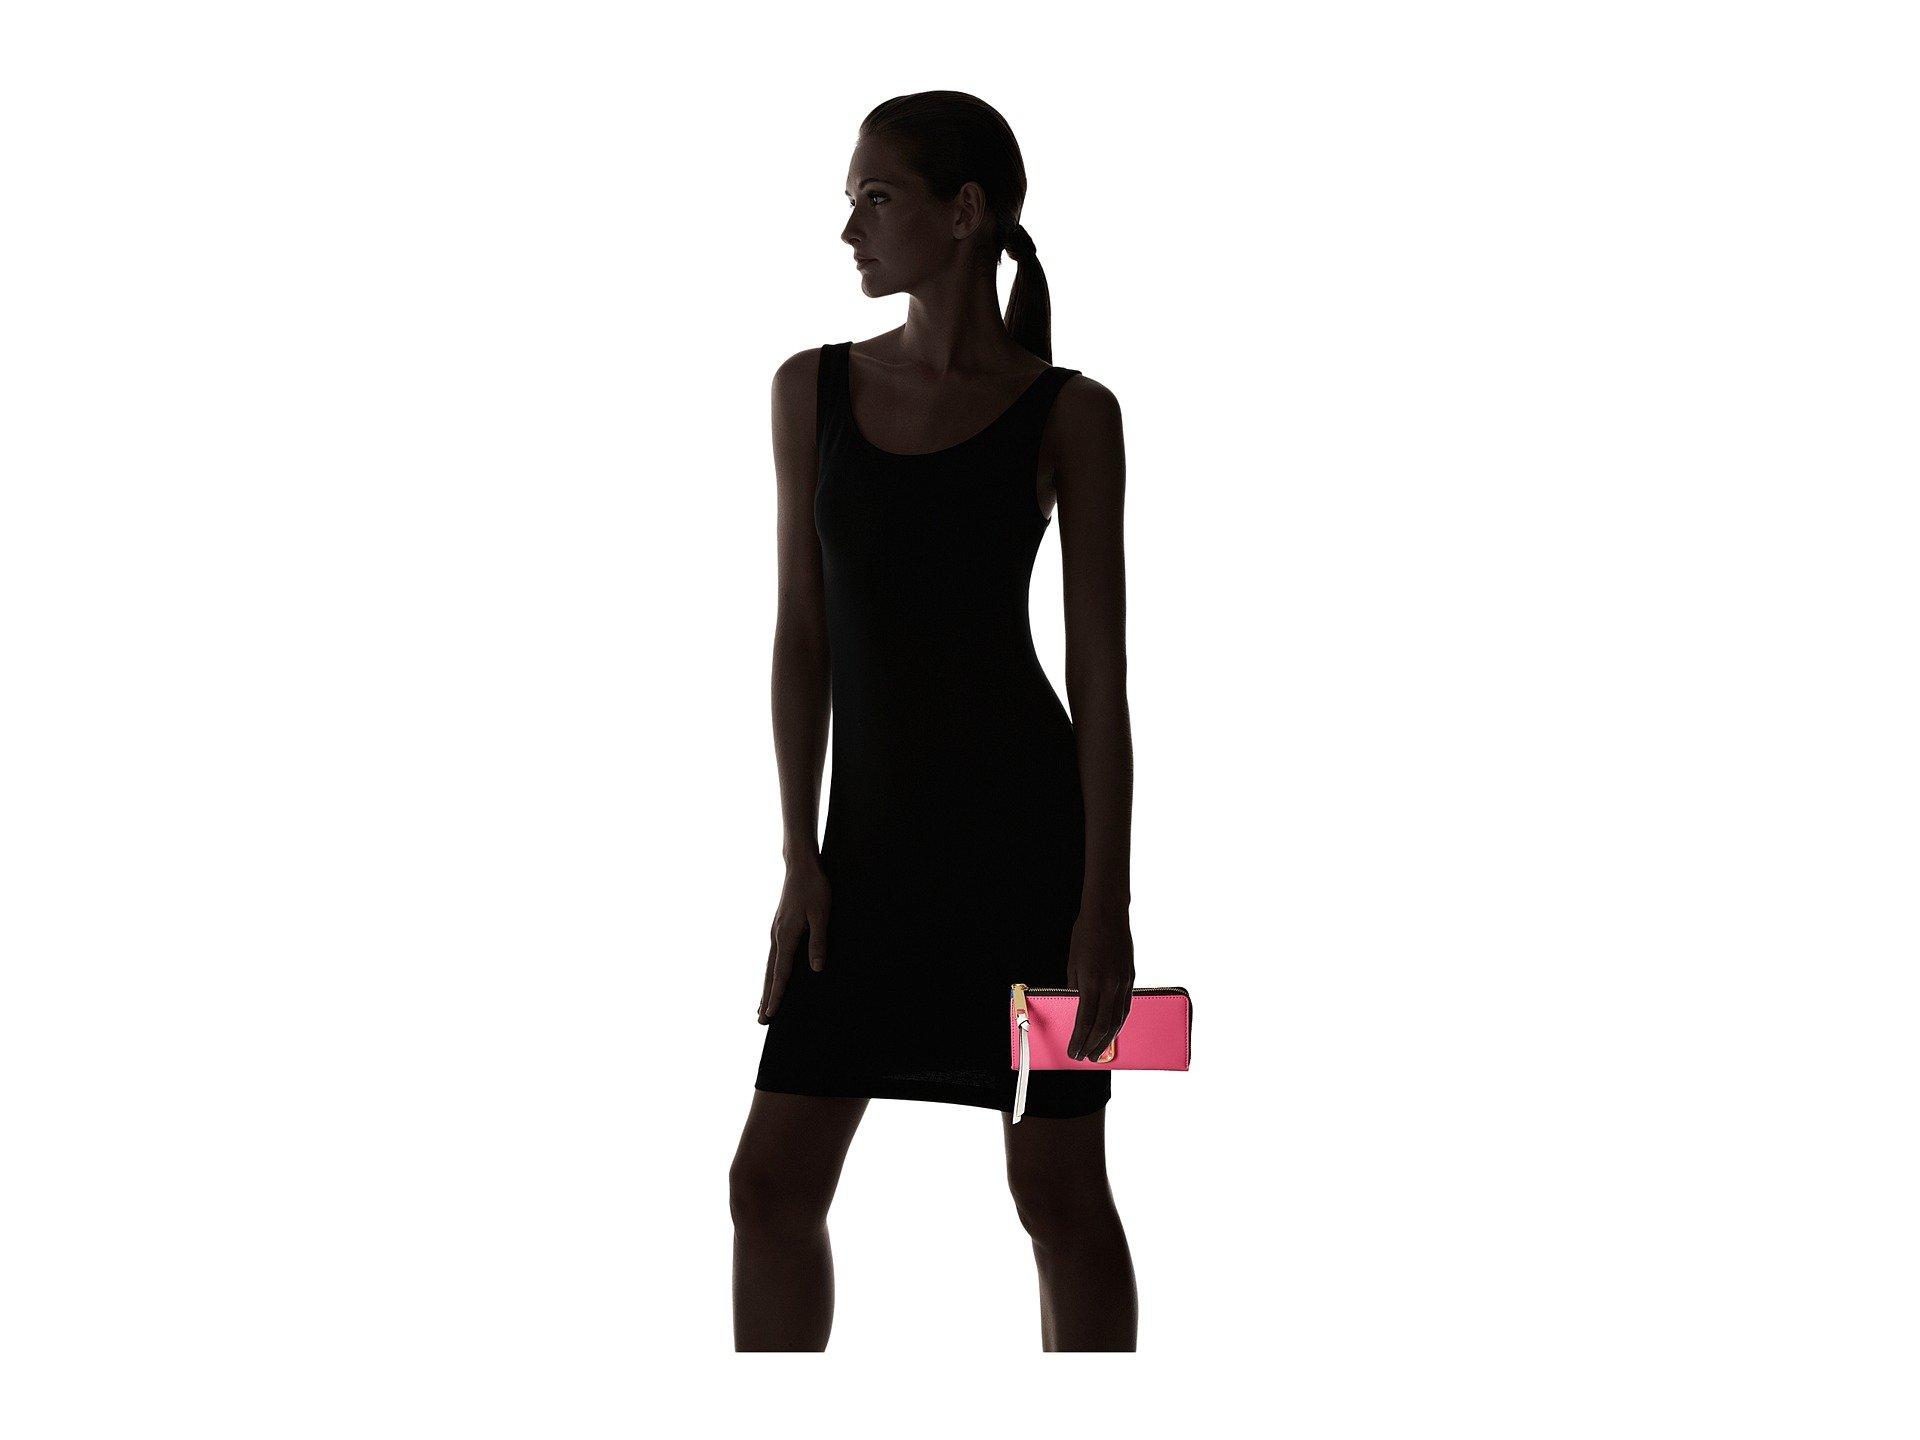 Zip 2 1 Multi Around Jacobs Snapshot Pink Marc Vivid wf6qItt